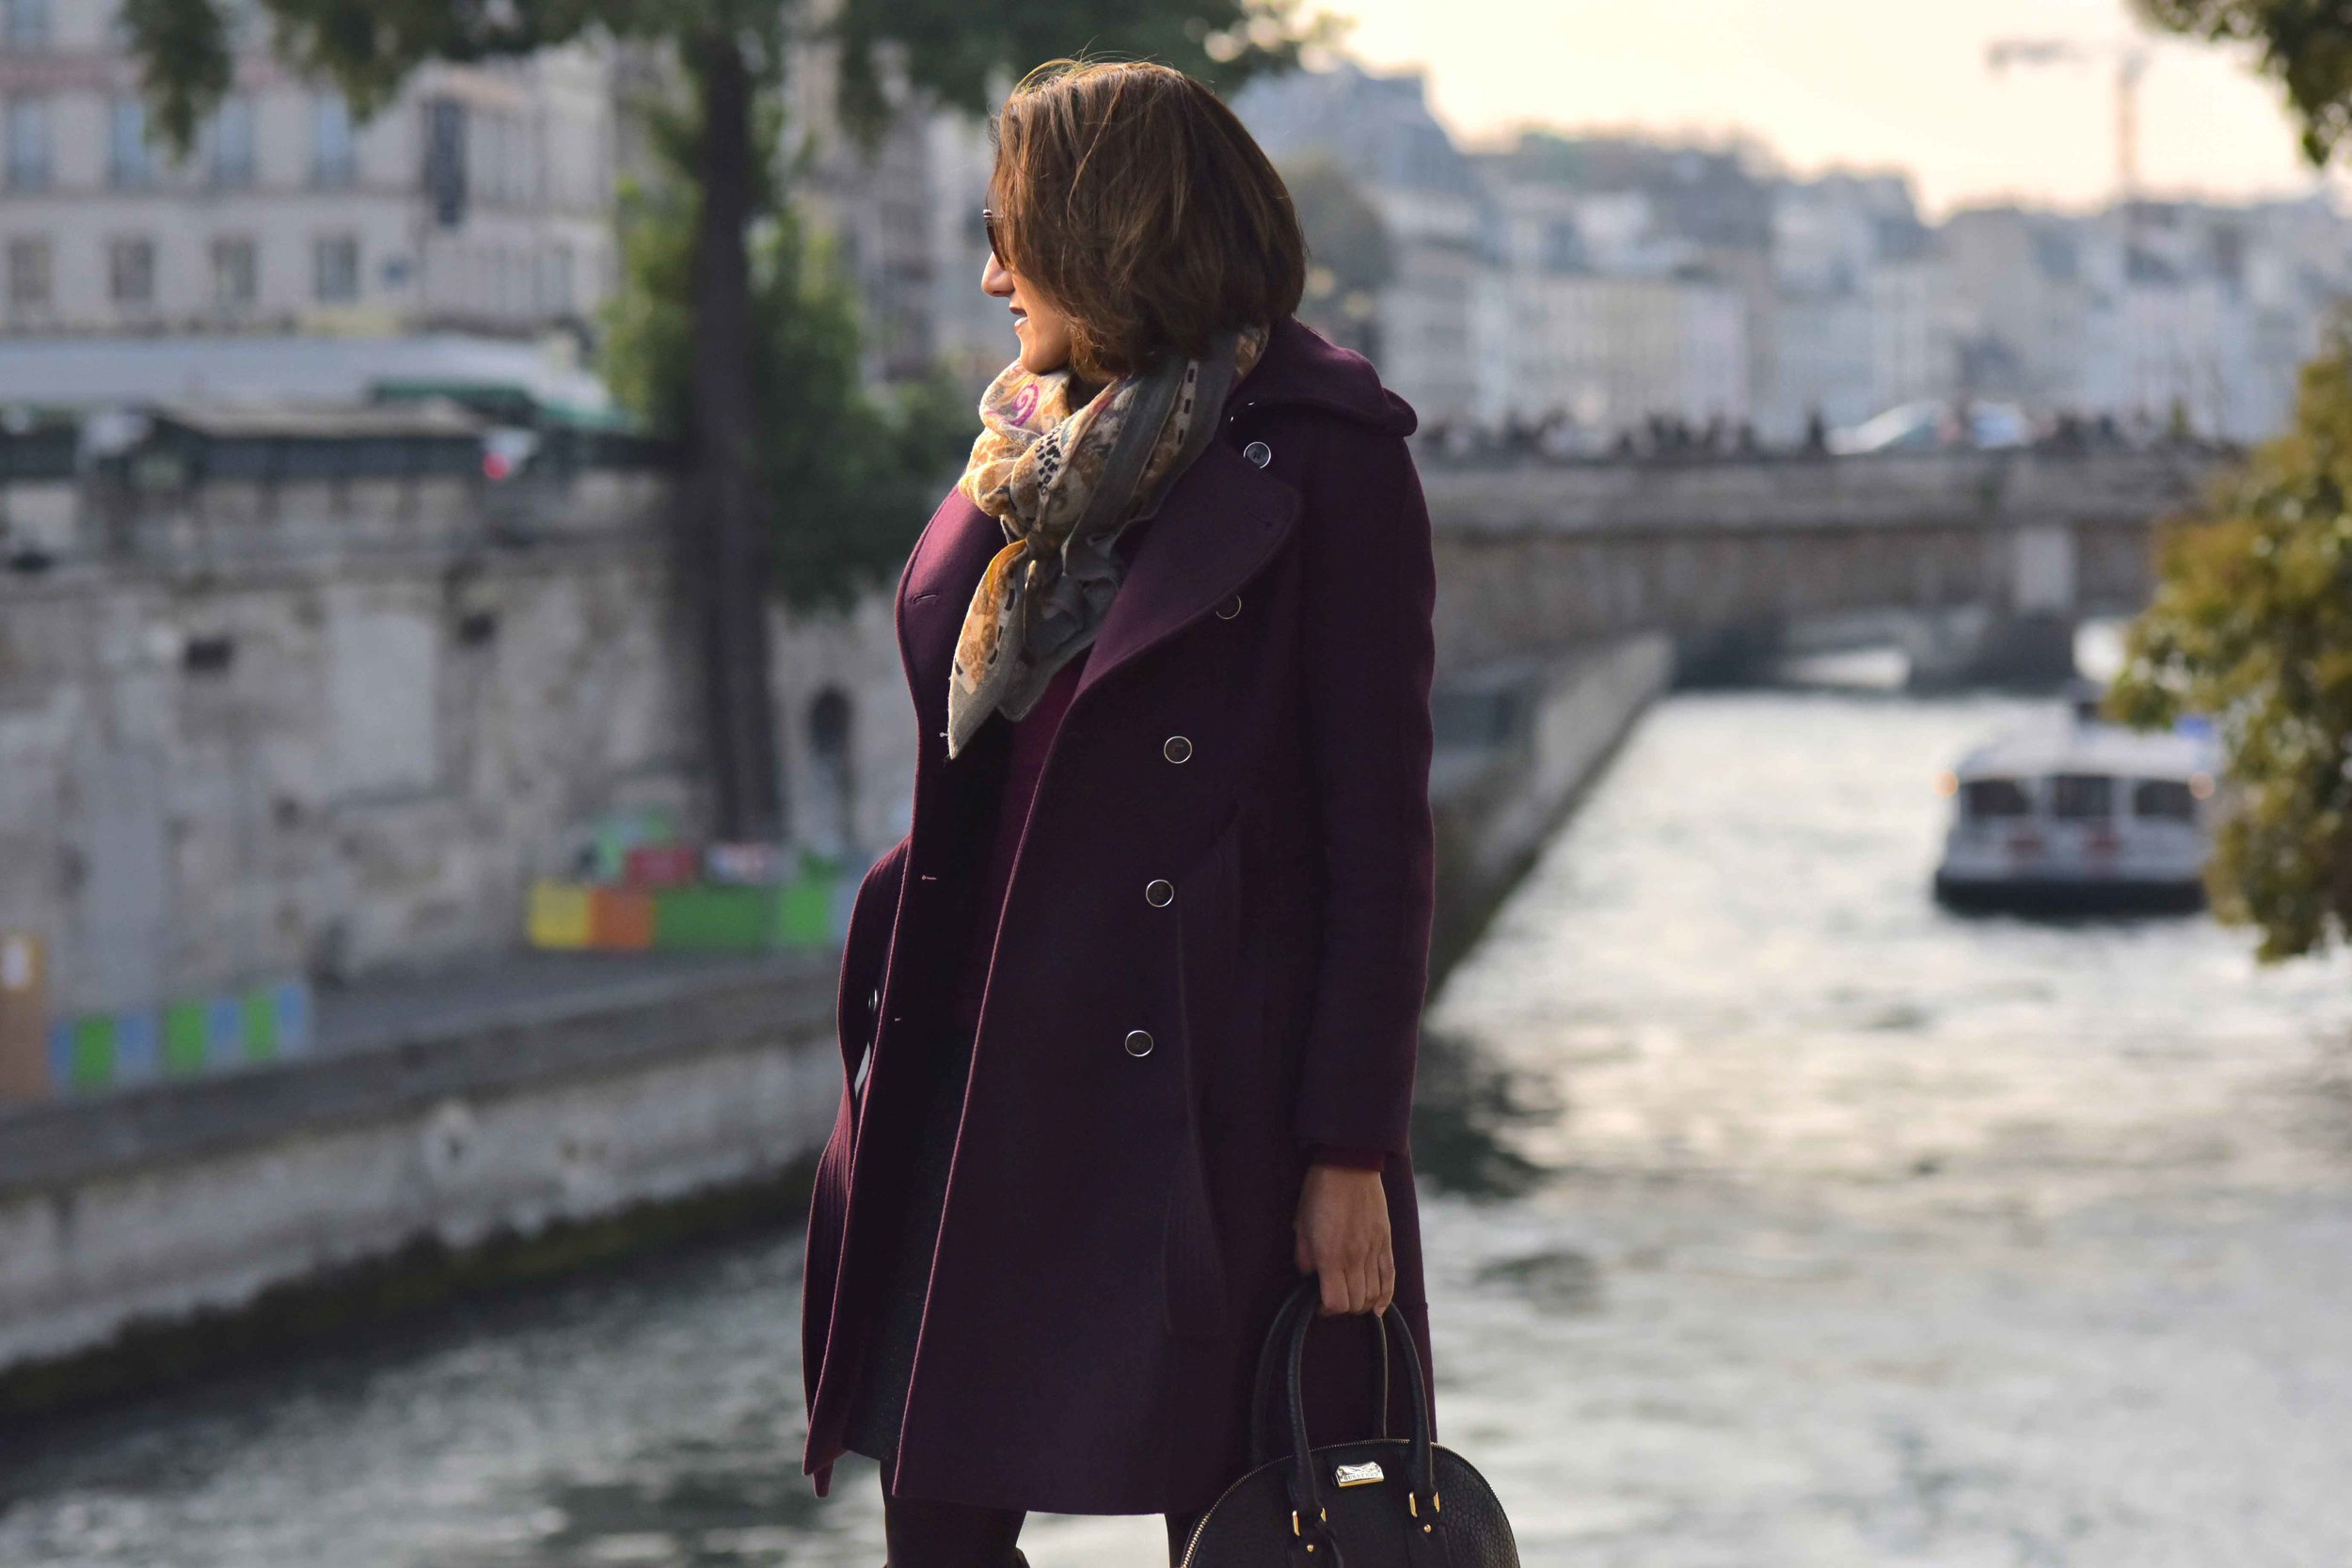 Karen Millen fall winter coat, Burberry bag, Hallhuber scarf, Guccci sunglasses, Notre-Dame, Paris. Image©sourcingstyle.com